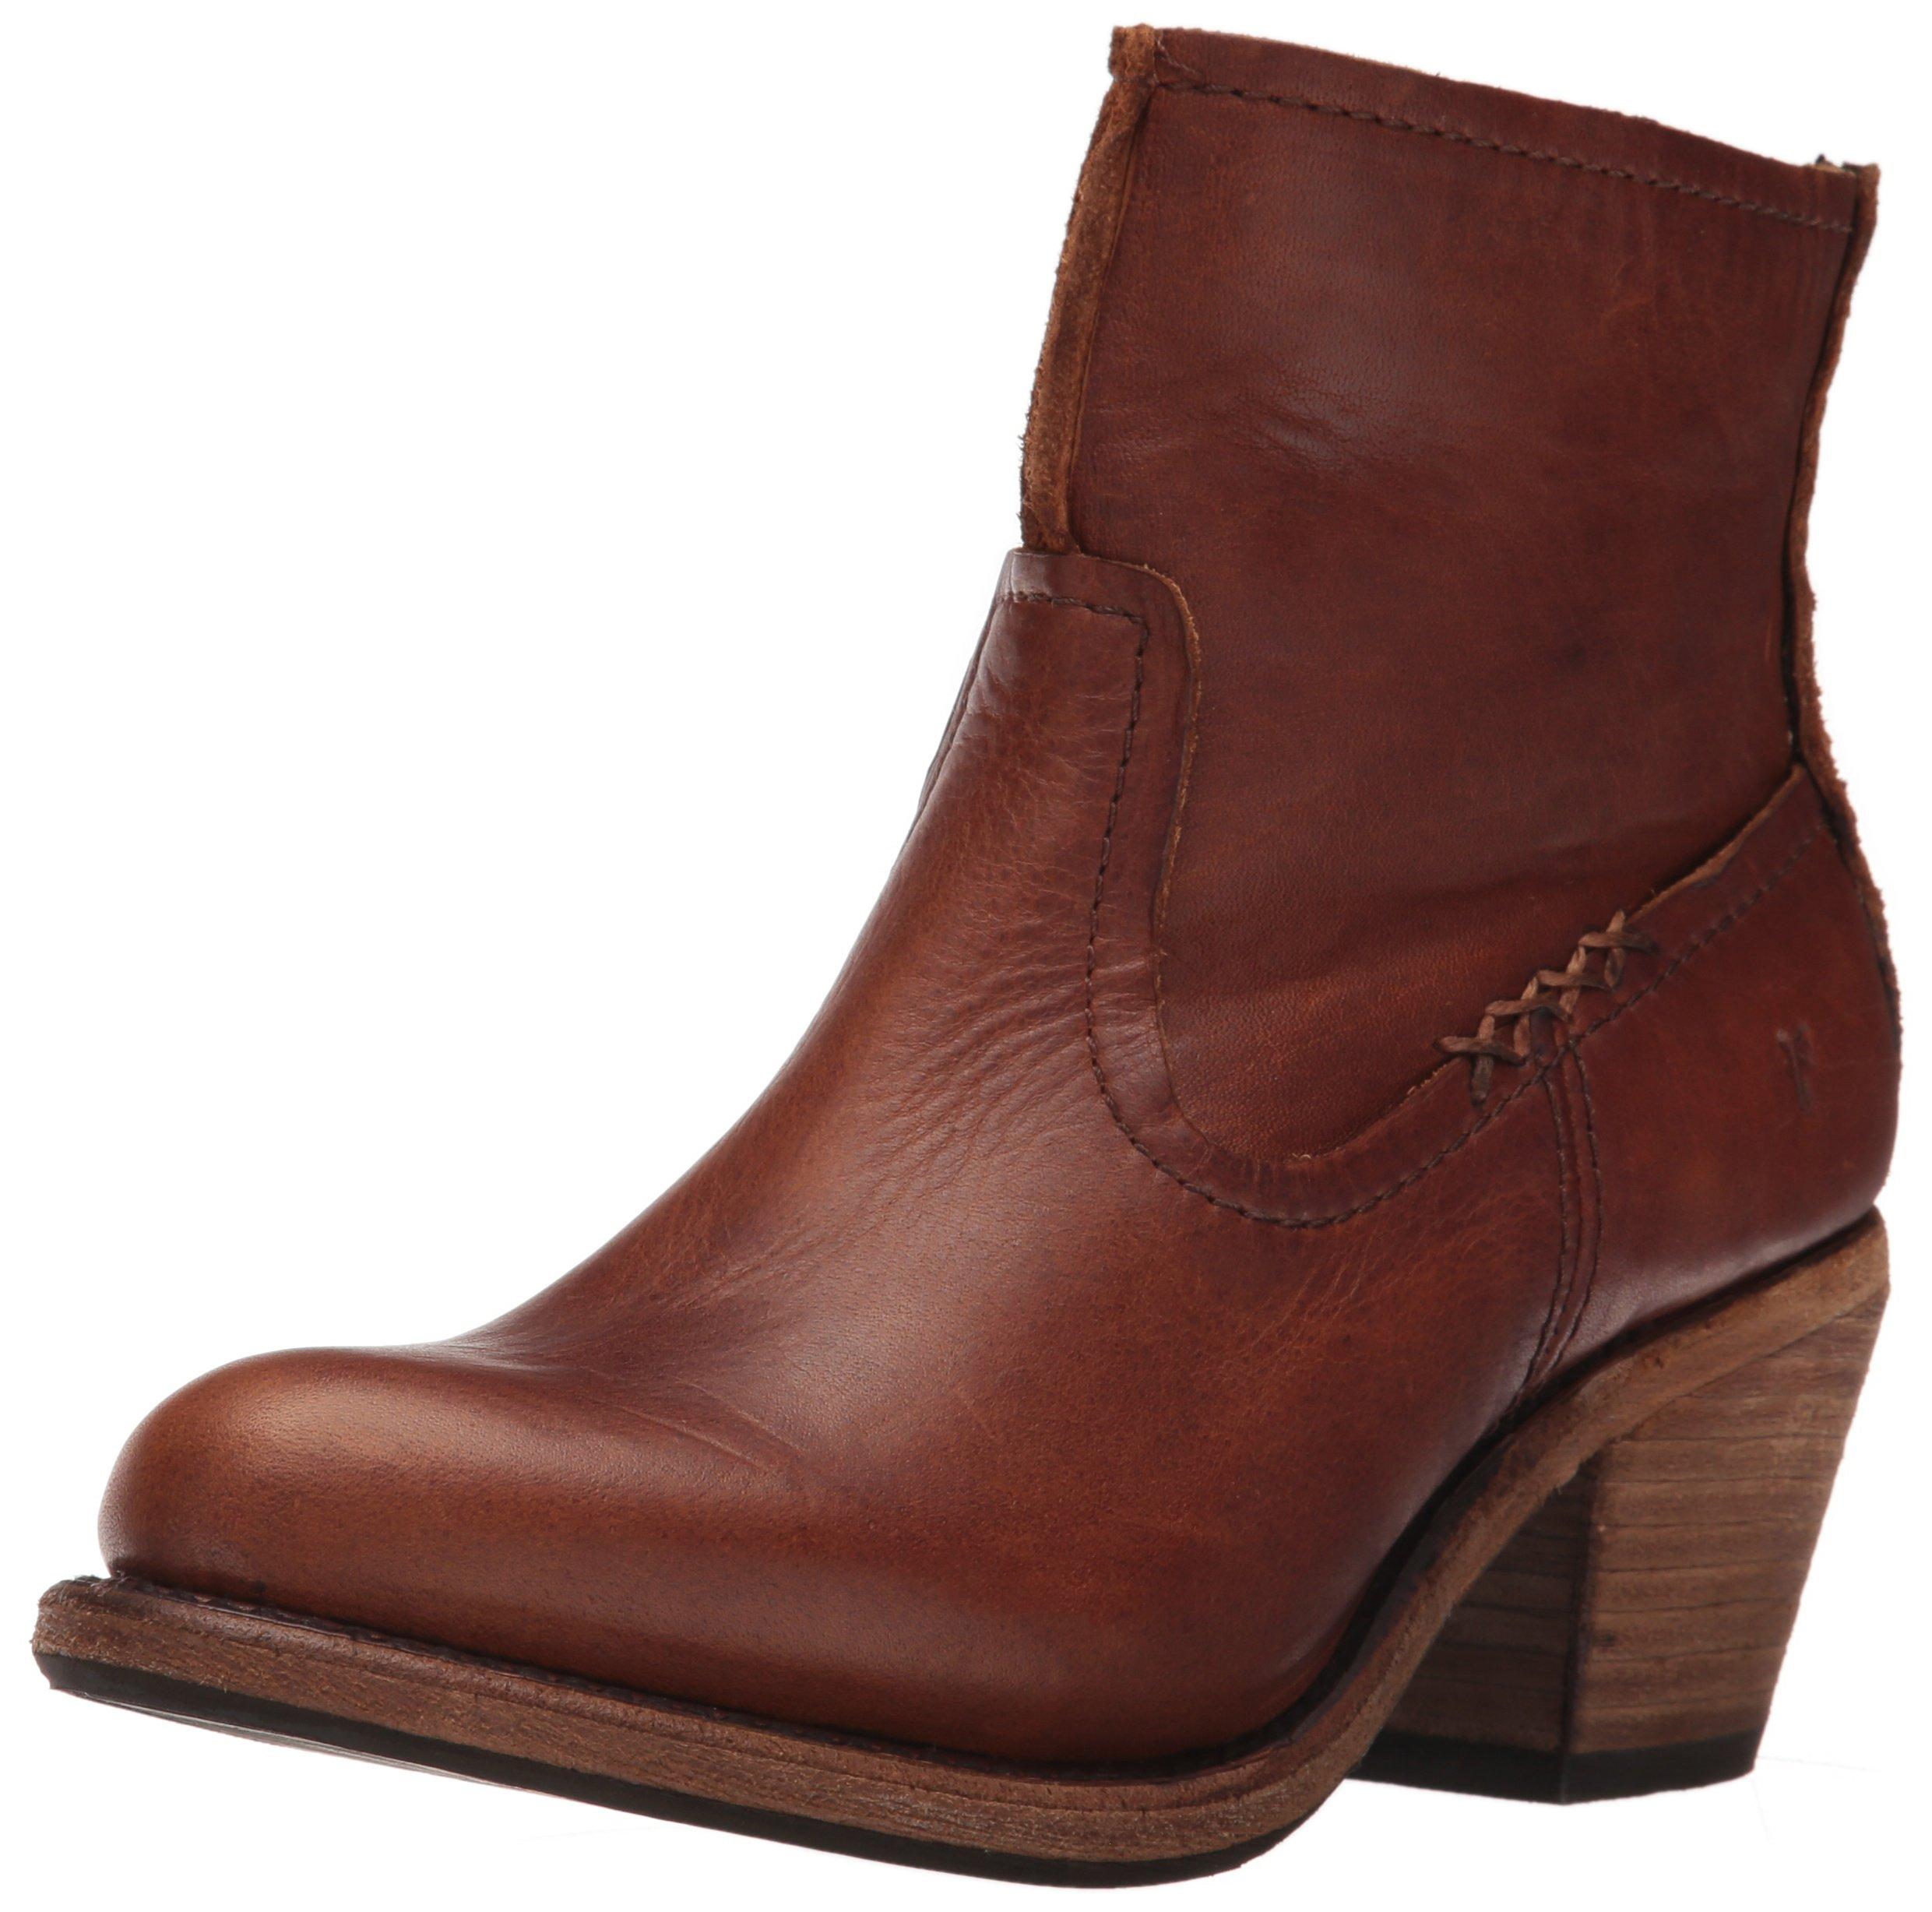 FRYE Women's Leslie Artisan Short Boot, Cognac, 7.5 M US